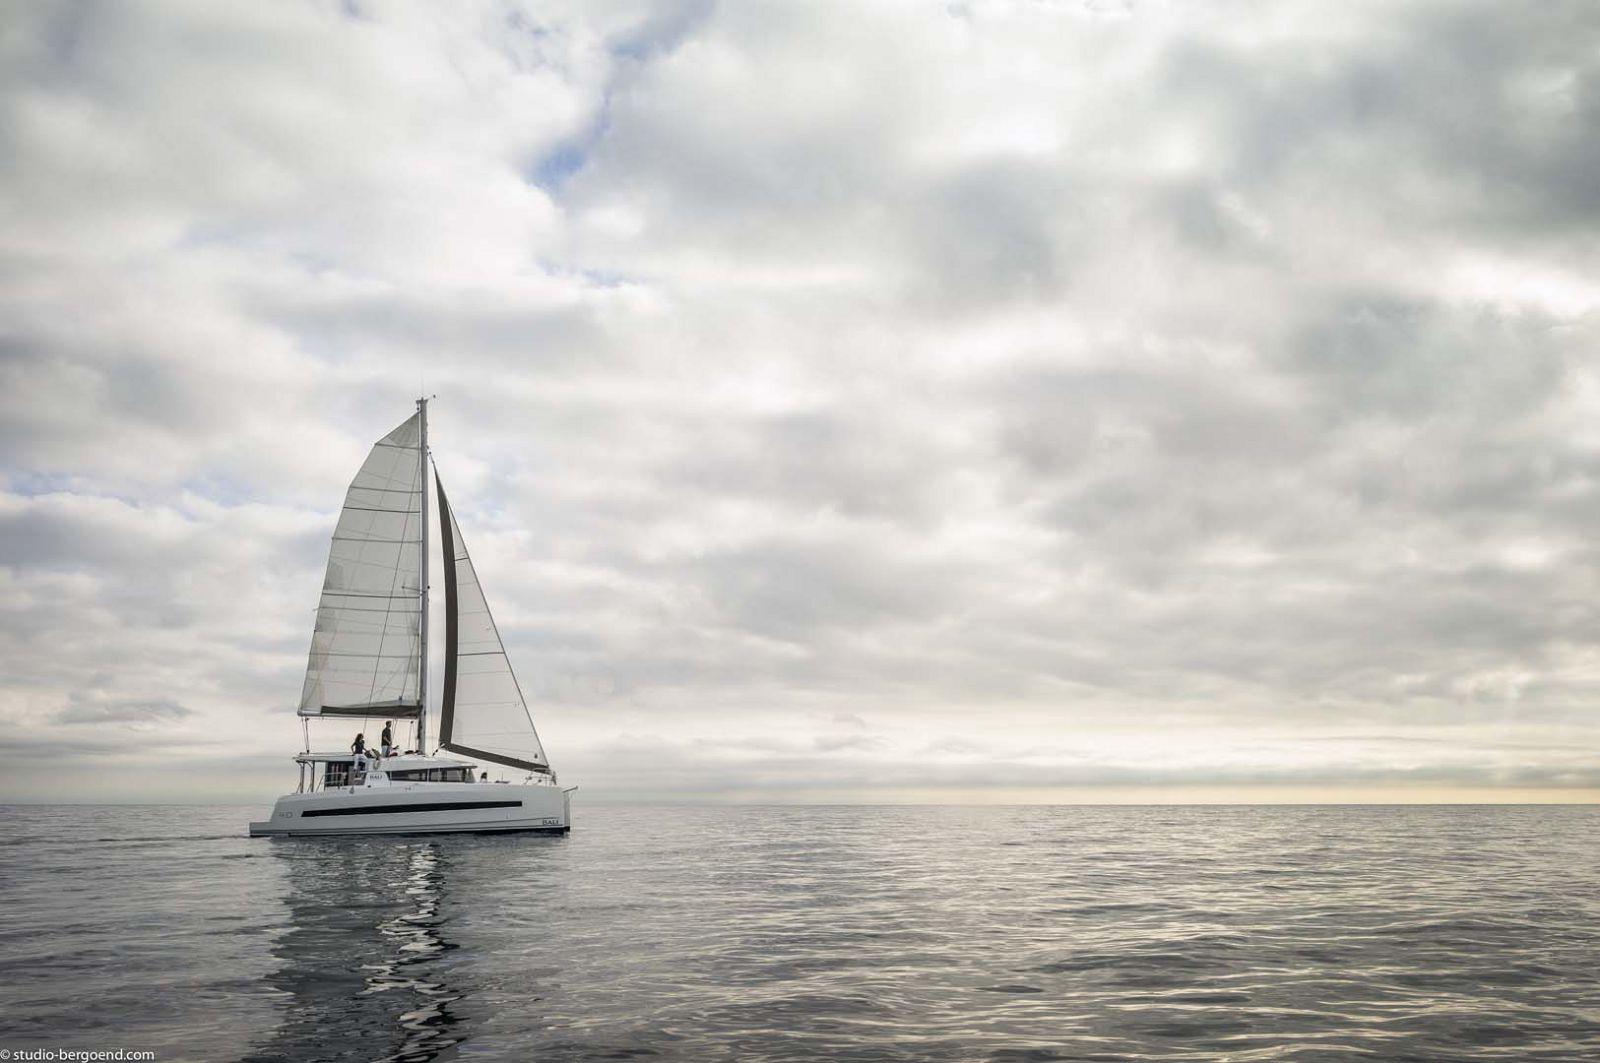 Bali 4.0 Catamaran Sailing